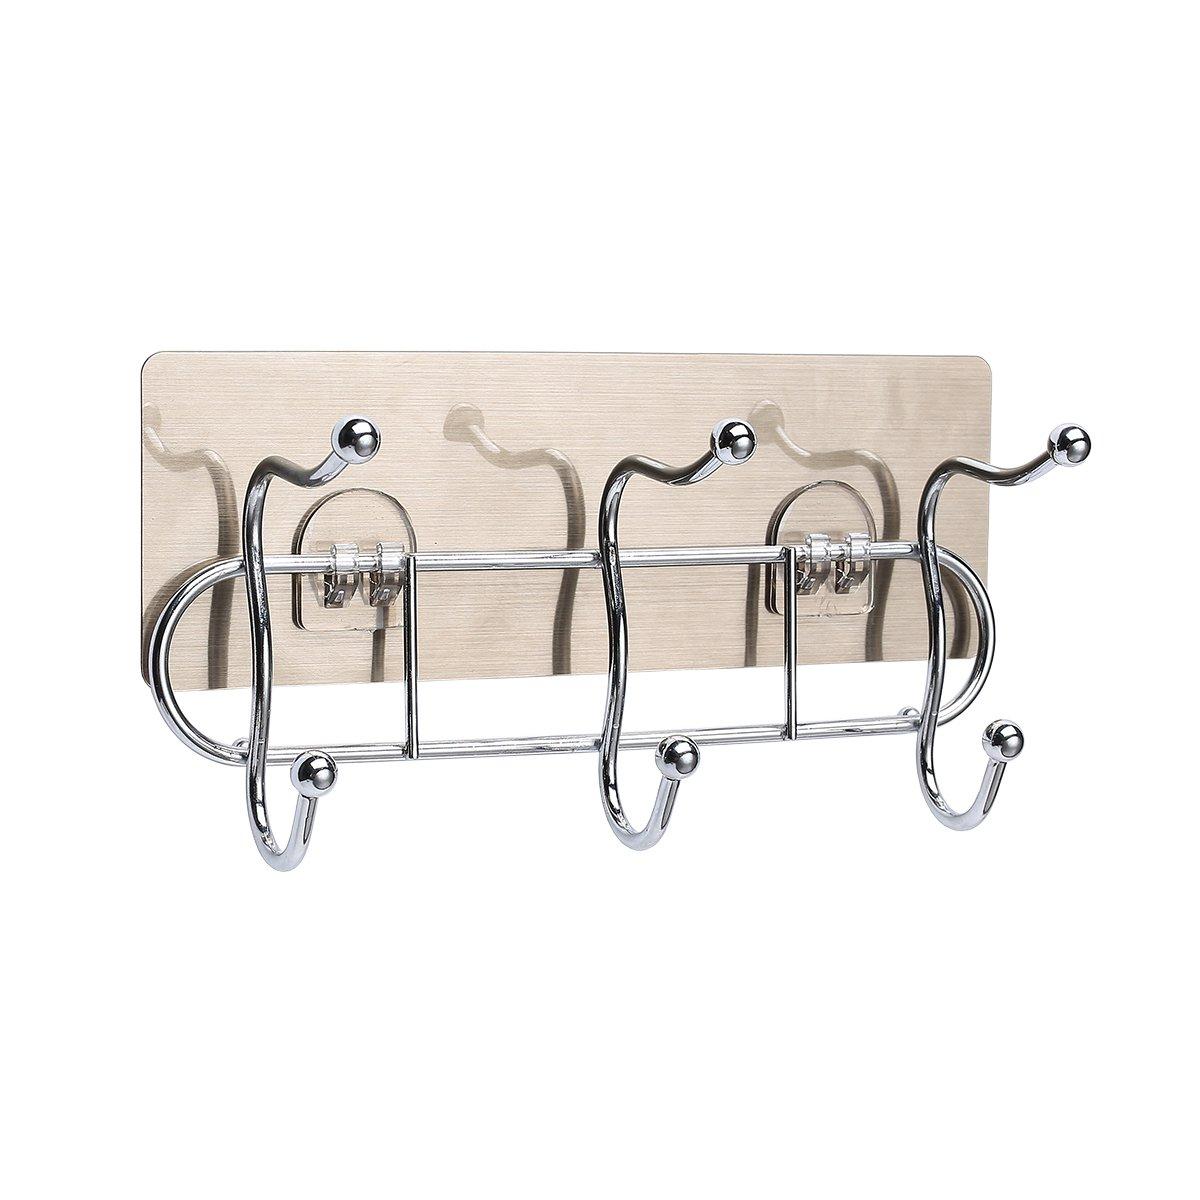 Metrekey Powerful Adhesive Hooks for Bathroom Wall Heavy Duty Towel Hanger Kitchen Door Multifunctional Key Holder Stainless Stell